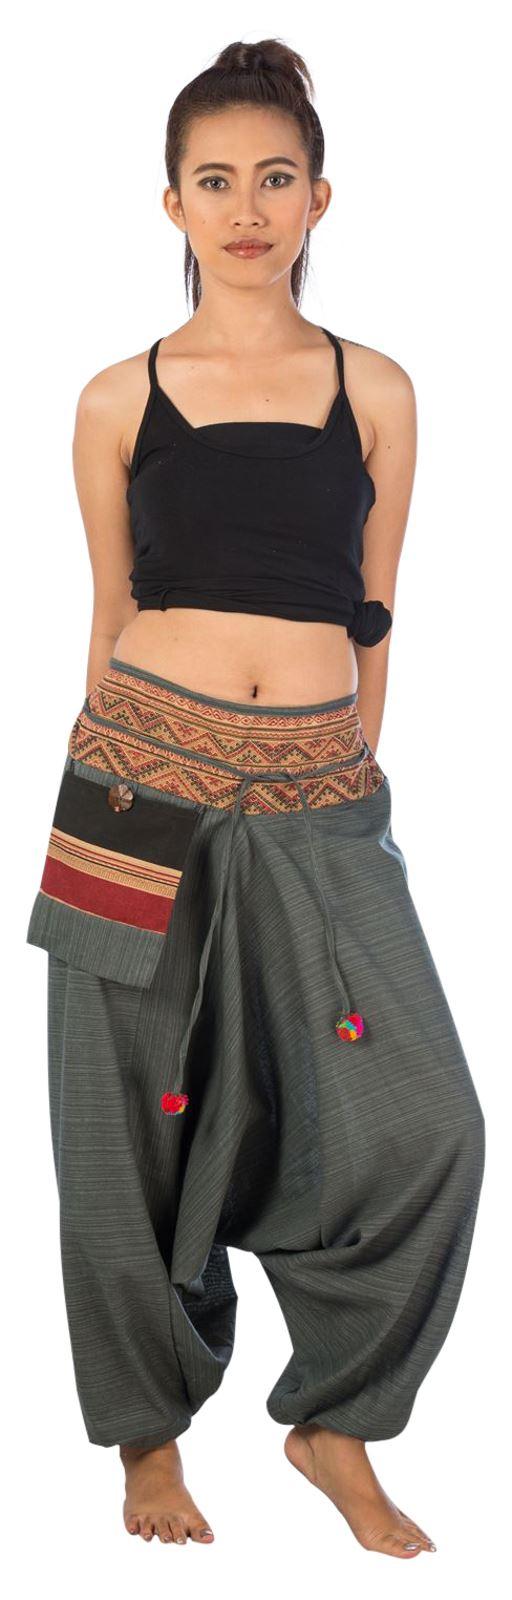 Brilliant Harem Yoga Pants Dance Gypsy Mc Hammer Pants For Men And Women Size 0-14 US   EBay